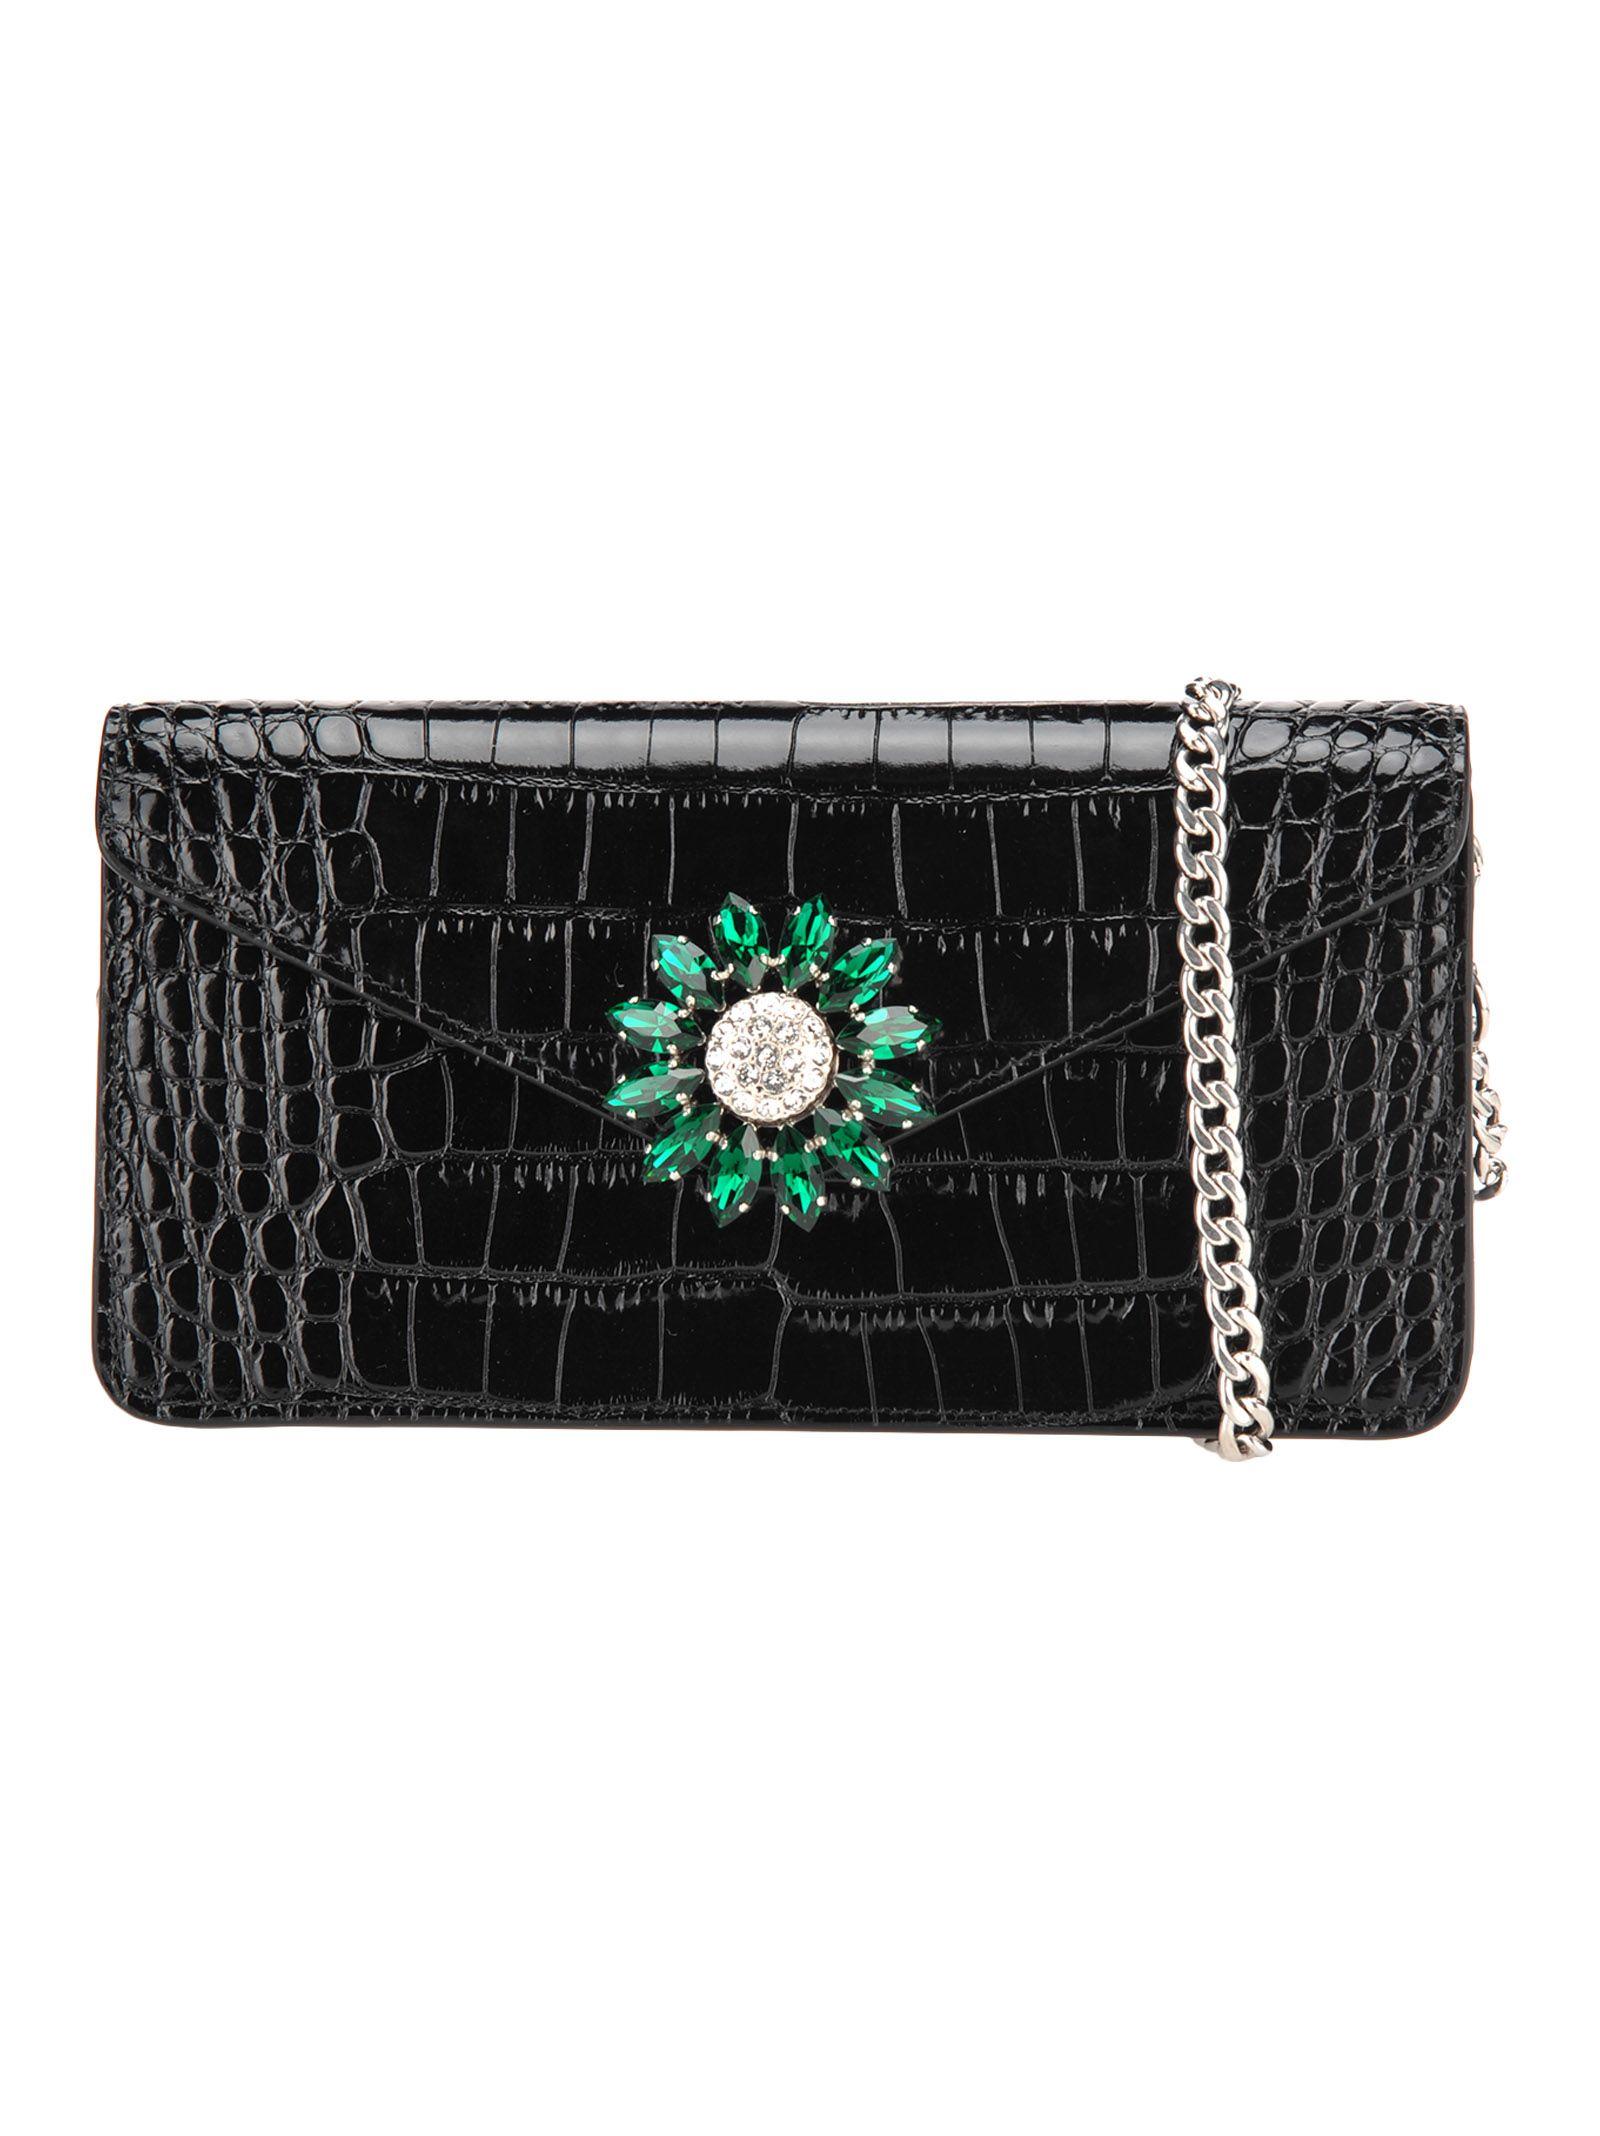 0ddc1deb7f49 Miu Miu Miu Miu Mini Chain Bag - BLACK - 10857204